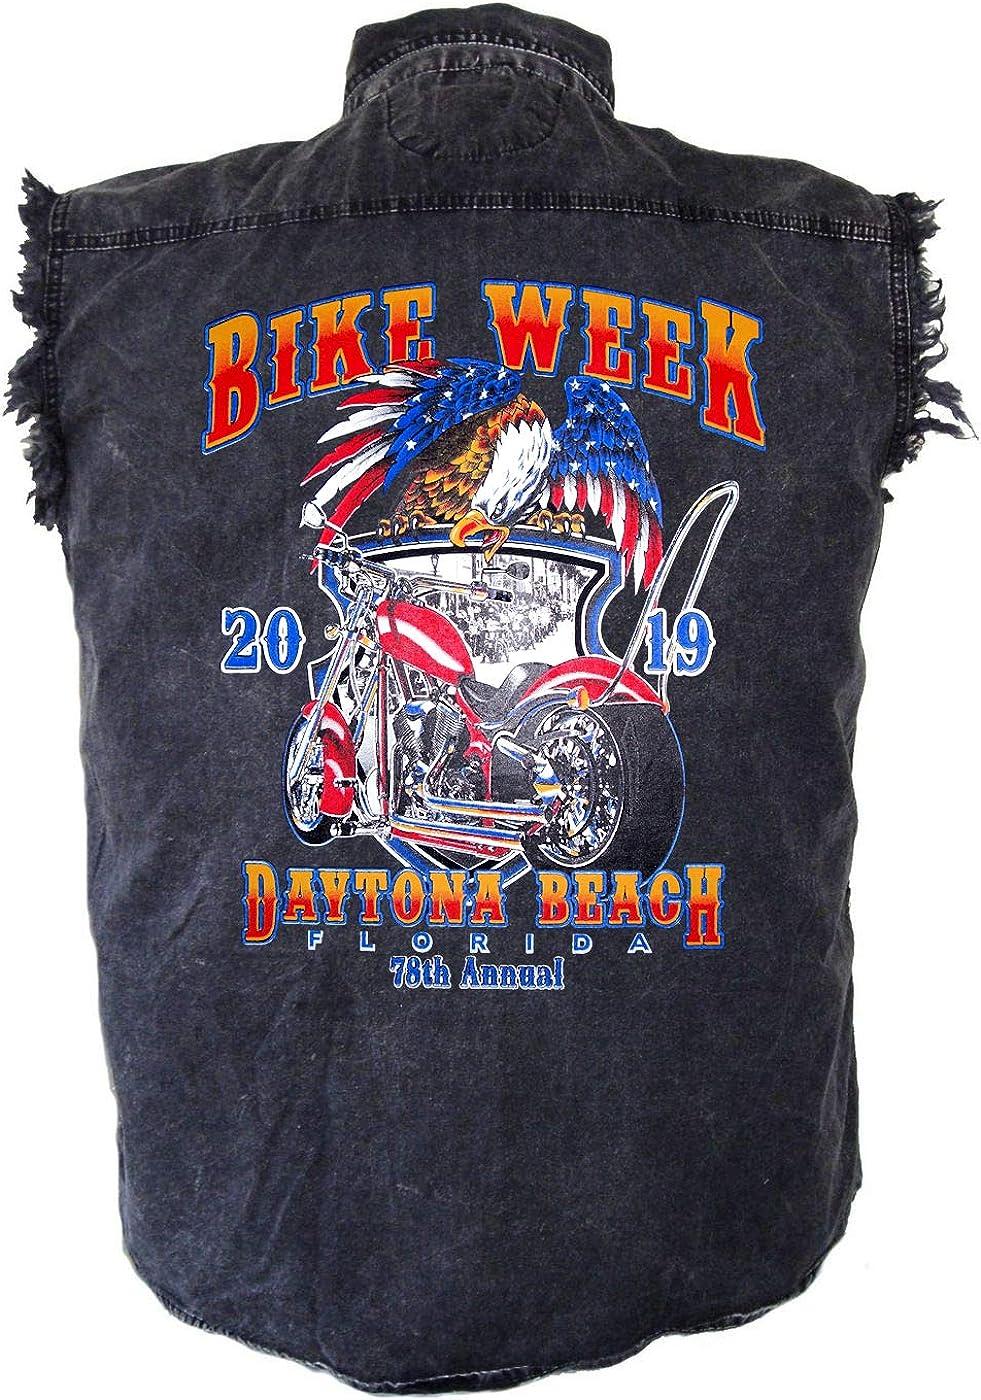 Leather Supreme Mens Daytona Bike Week 2019 Motorcycle Denim Biker Shirt